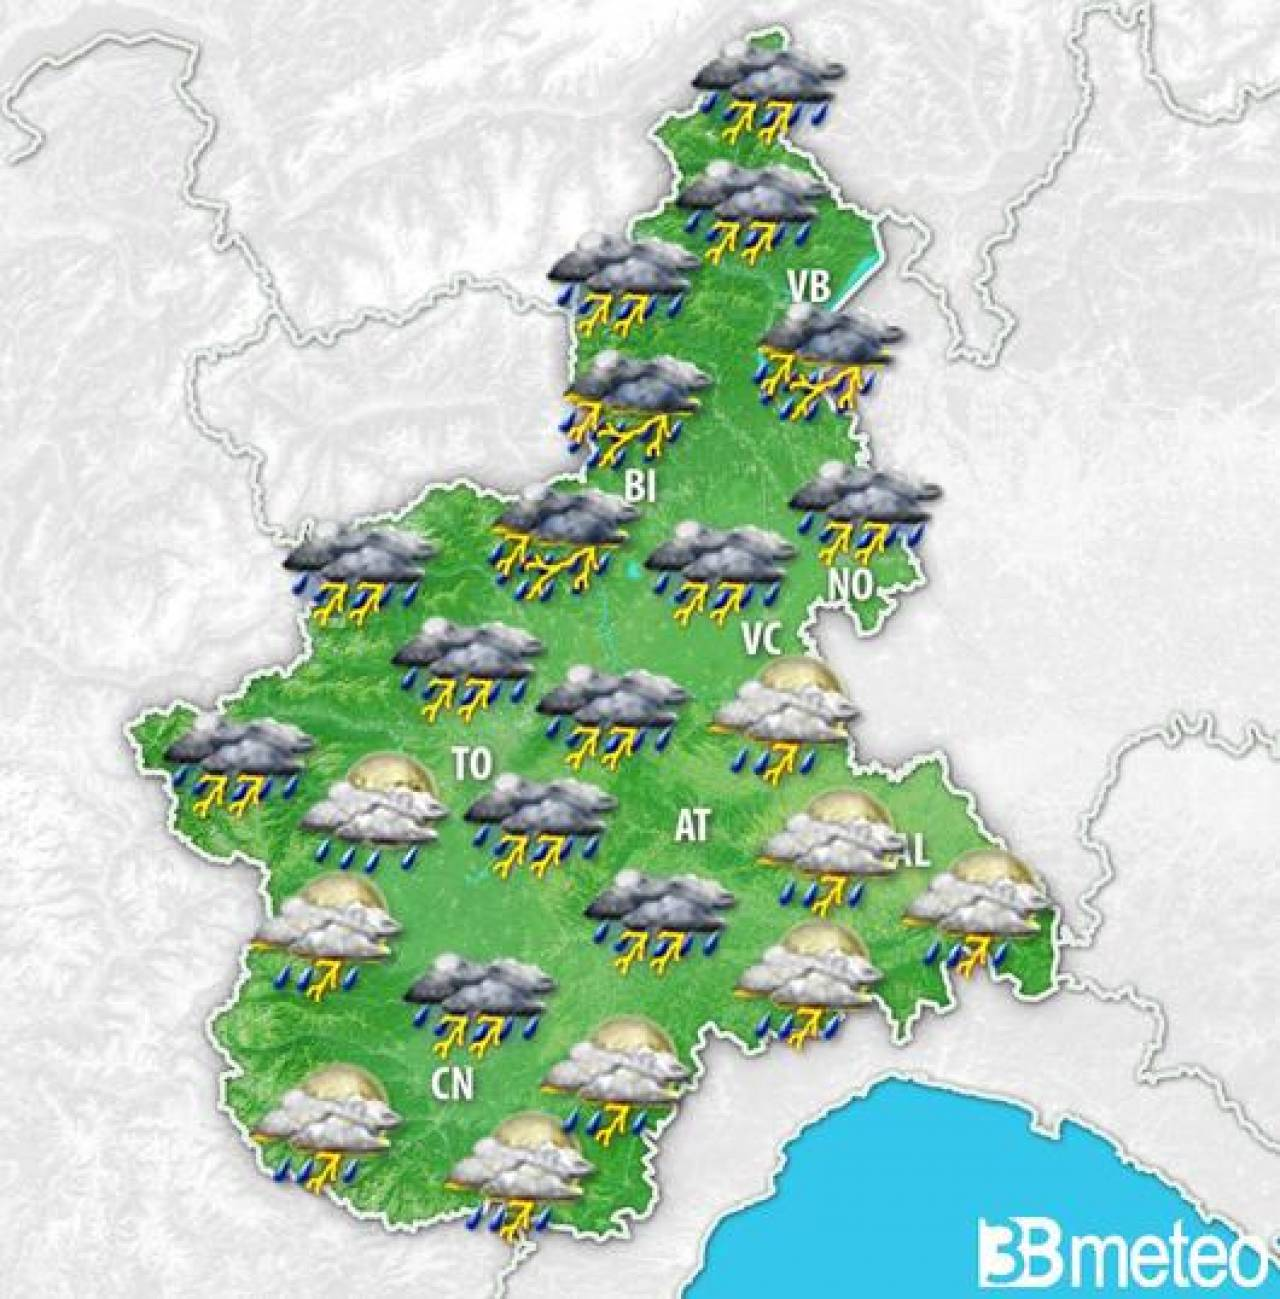 Meteo Weekend Piemonte con temporali e calo delle temperature